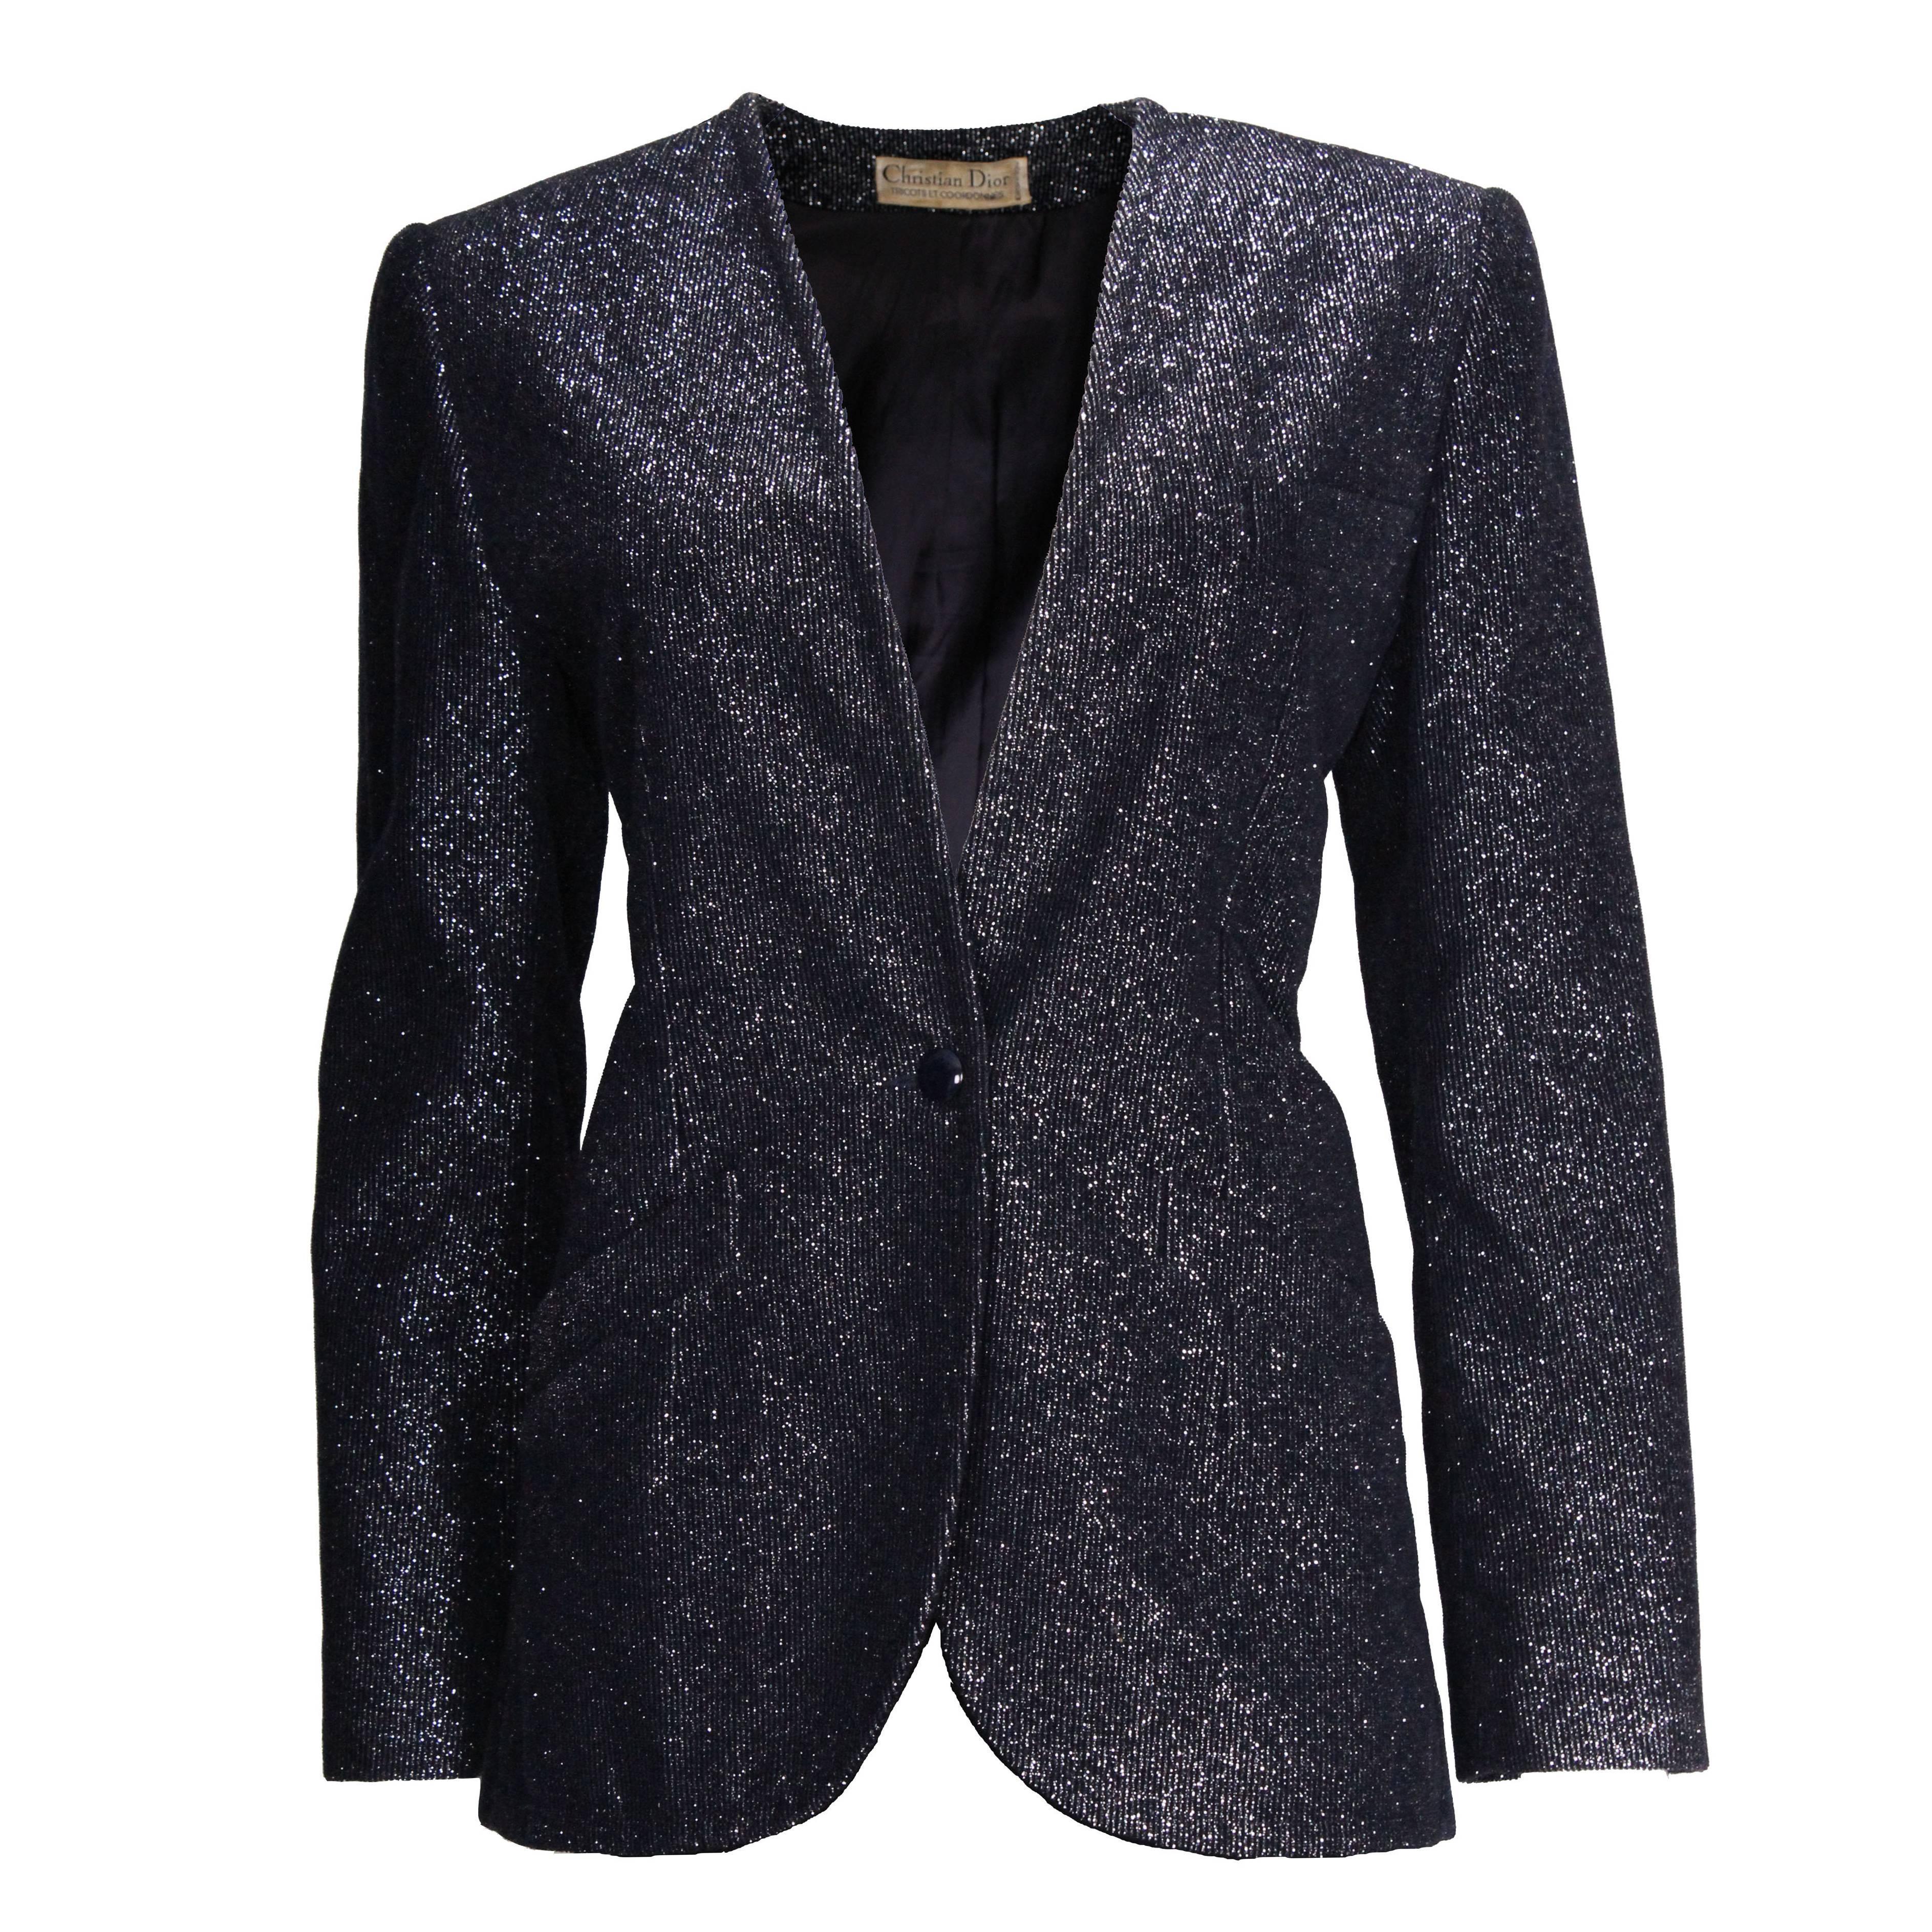 b542309070e Vintage Christian Dior Jackets - 103 For Sale at 1stdibs